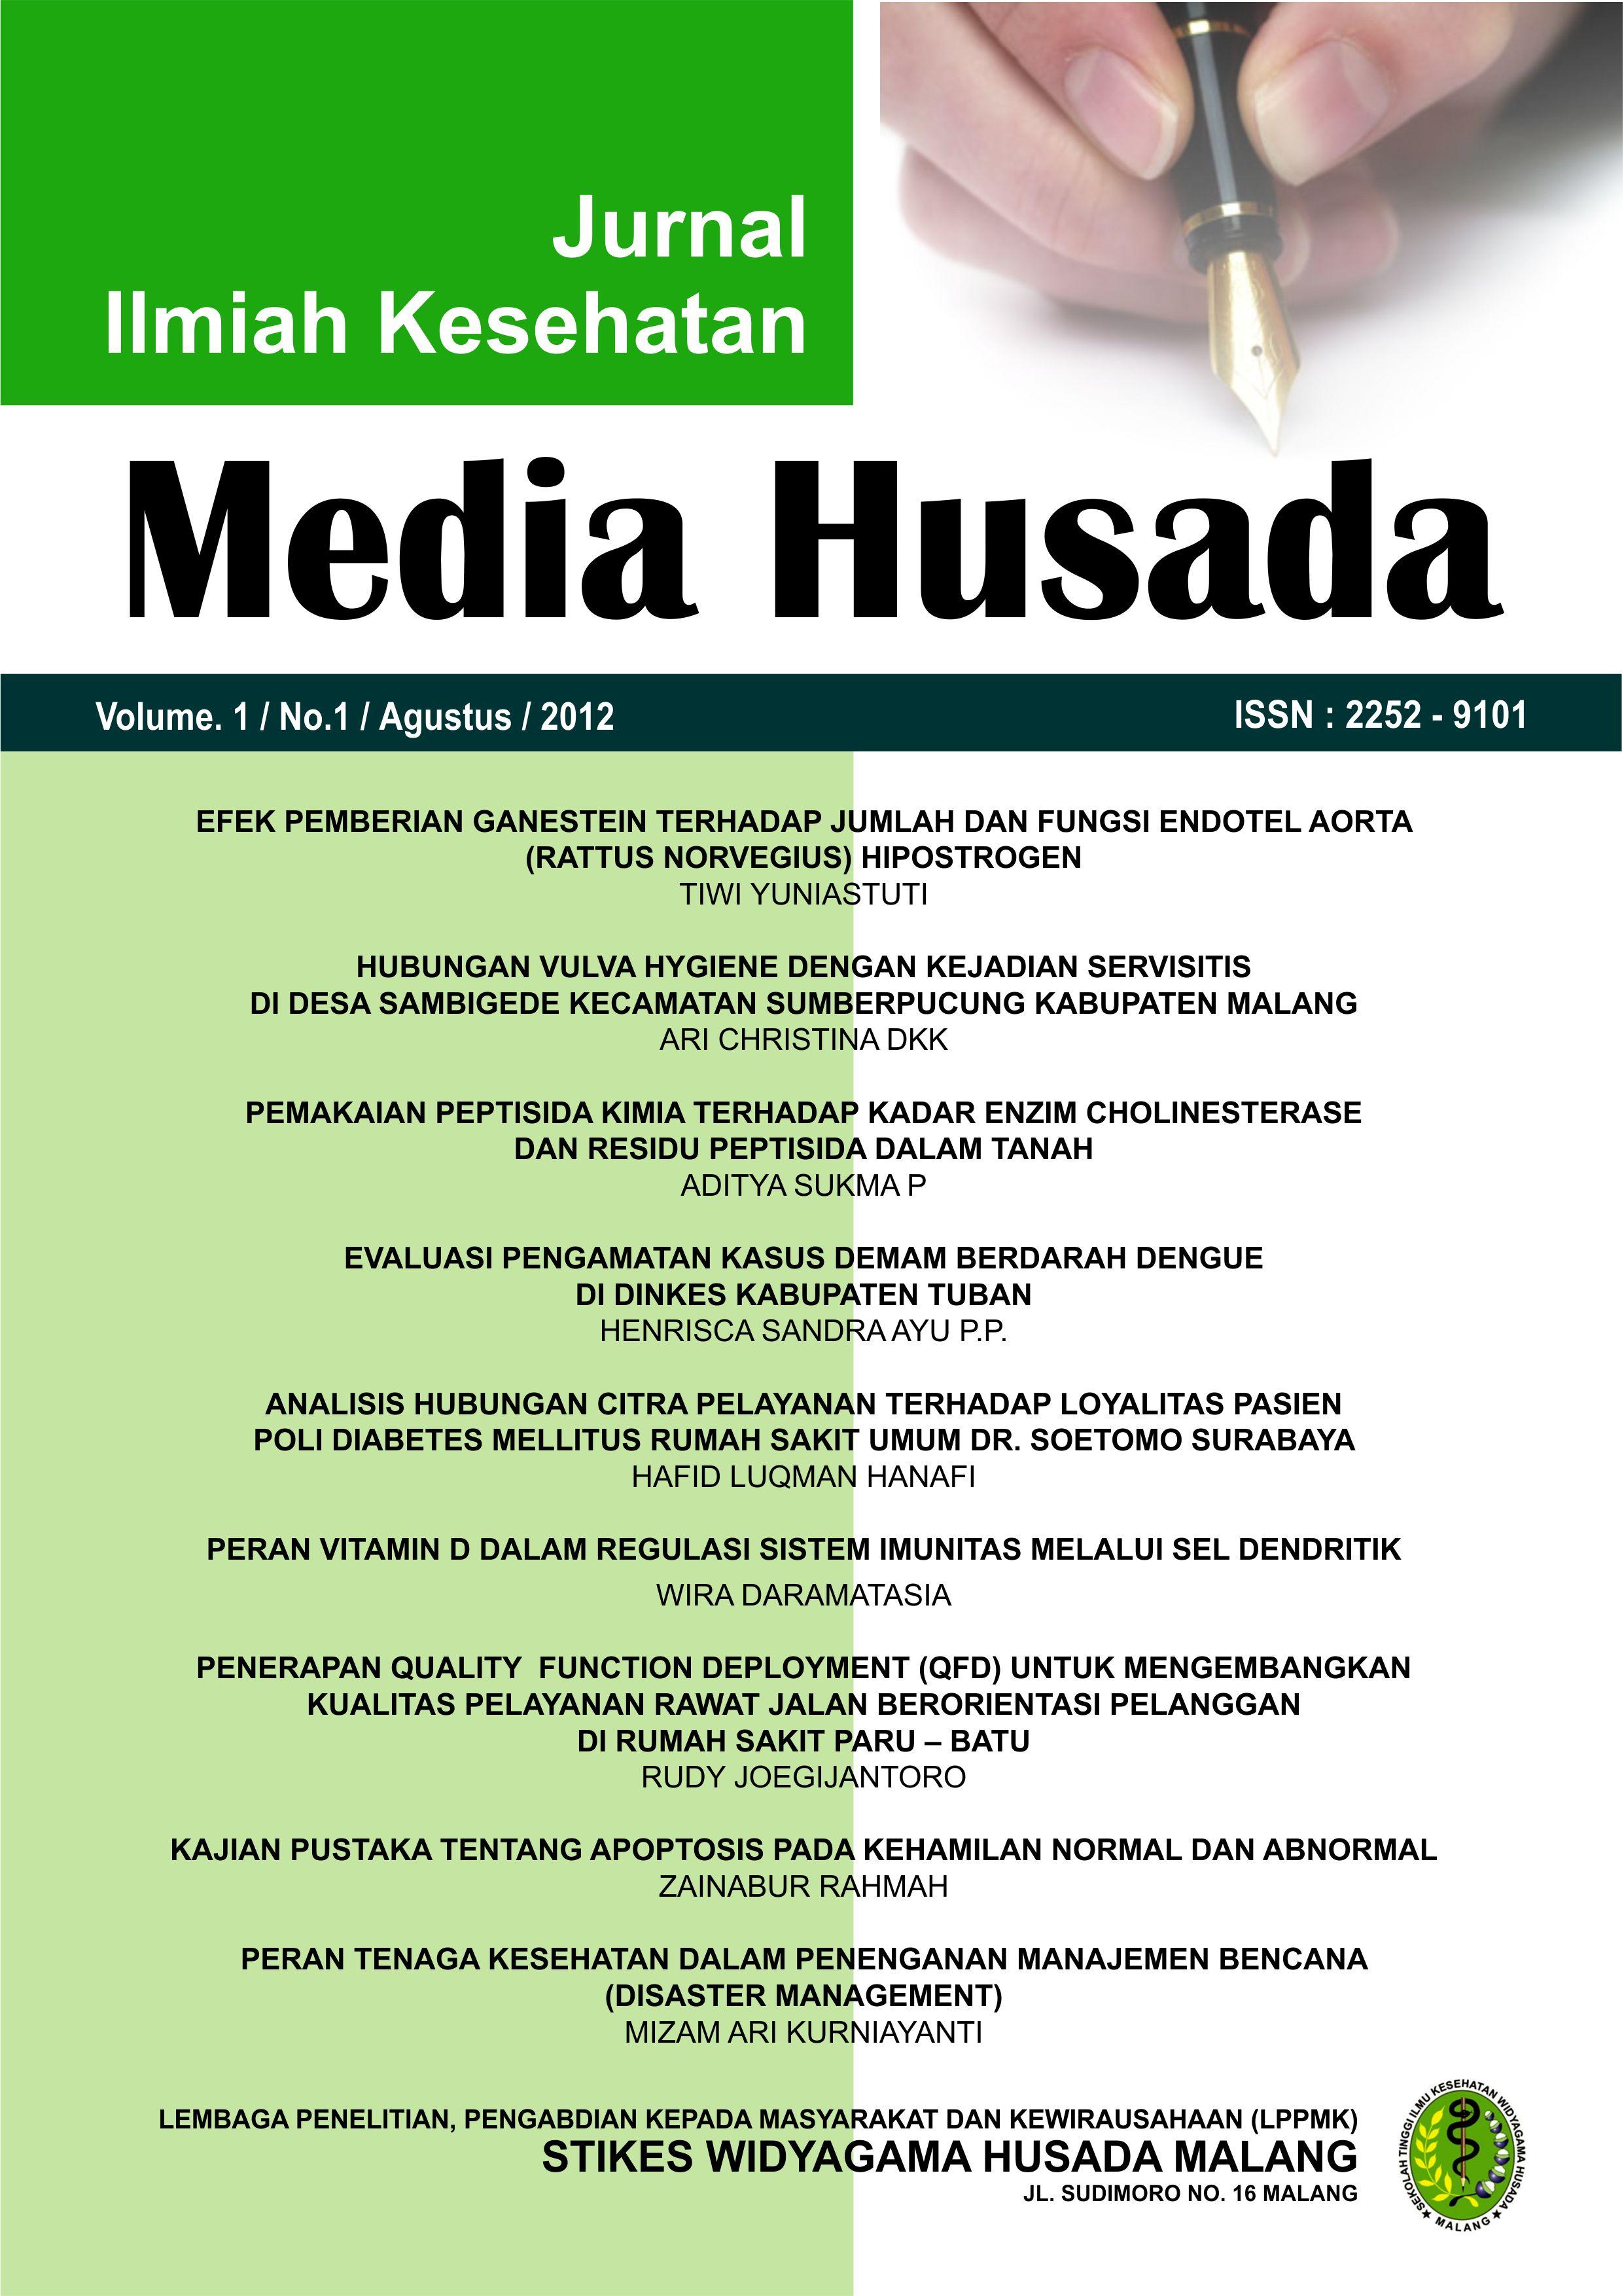 edisi Agustus 2012